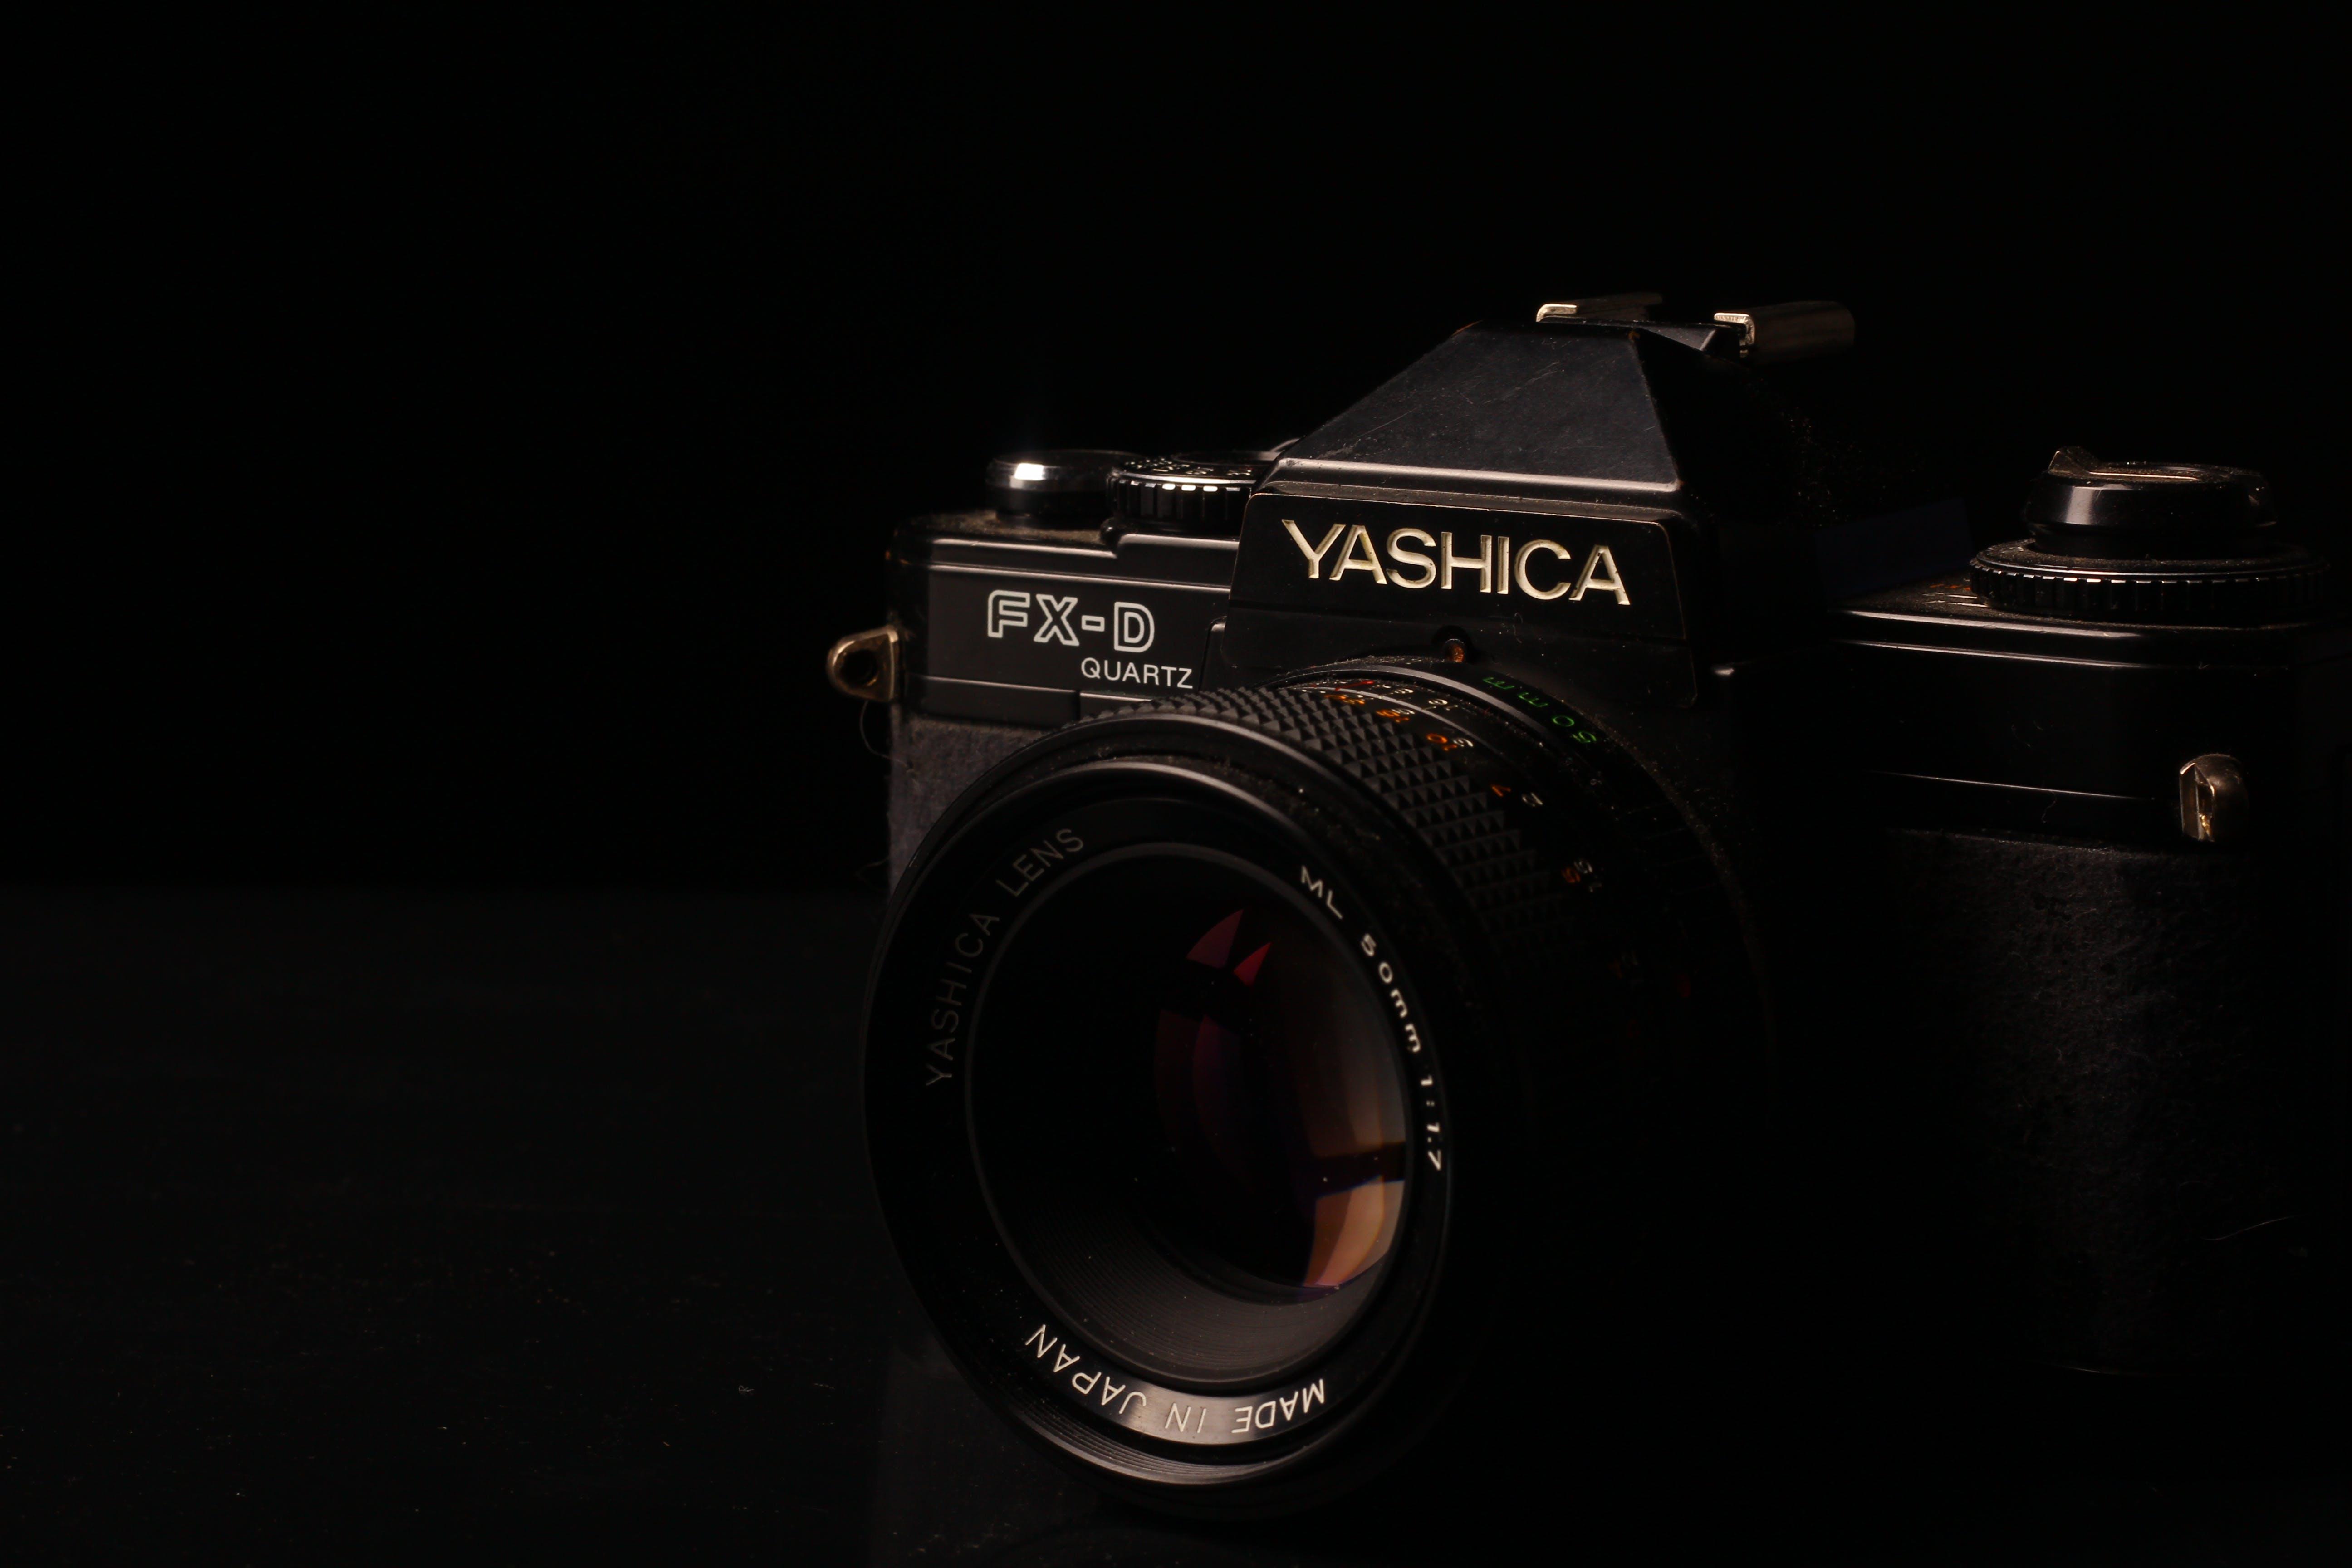 Close-up Photo of Black Yashica FX-D Camera